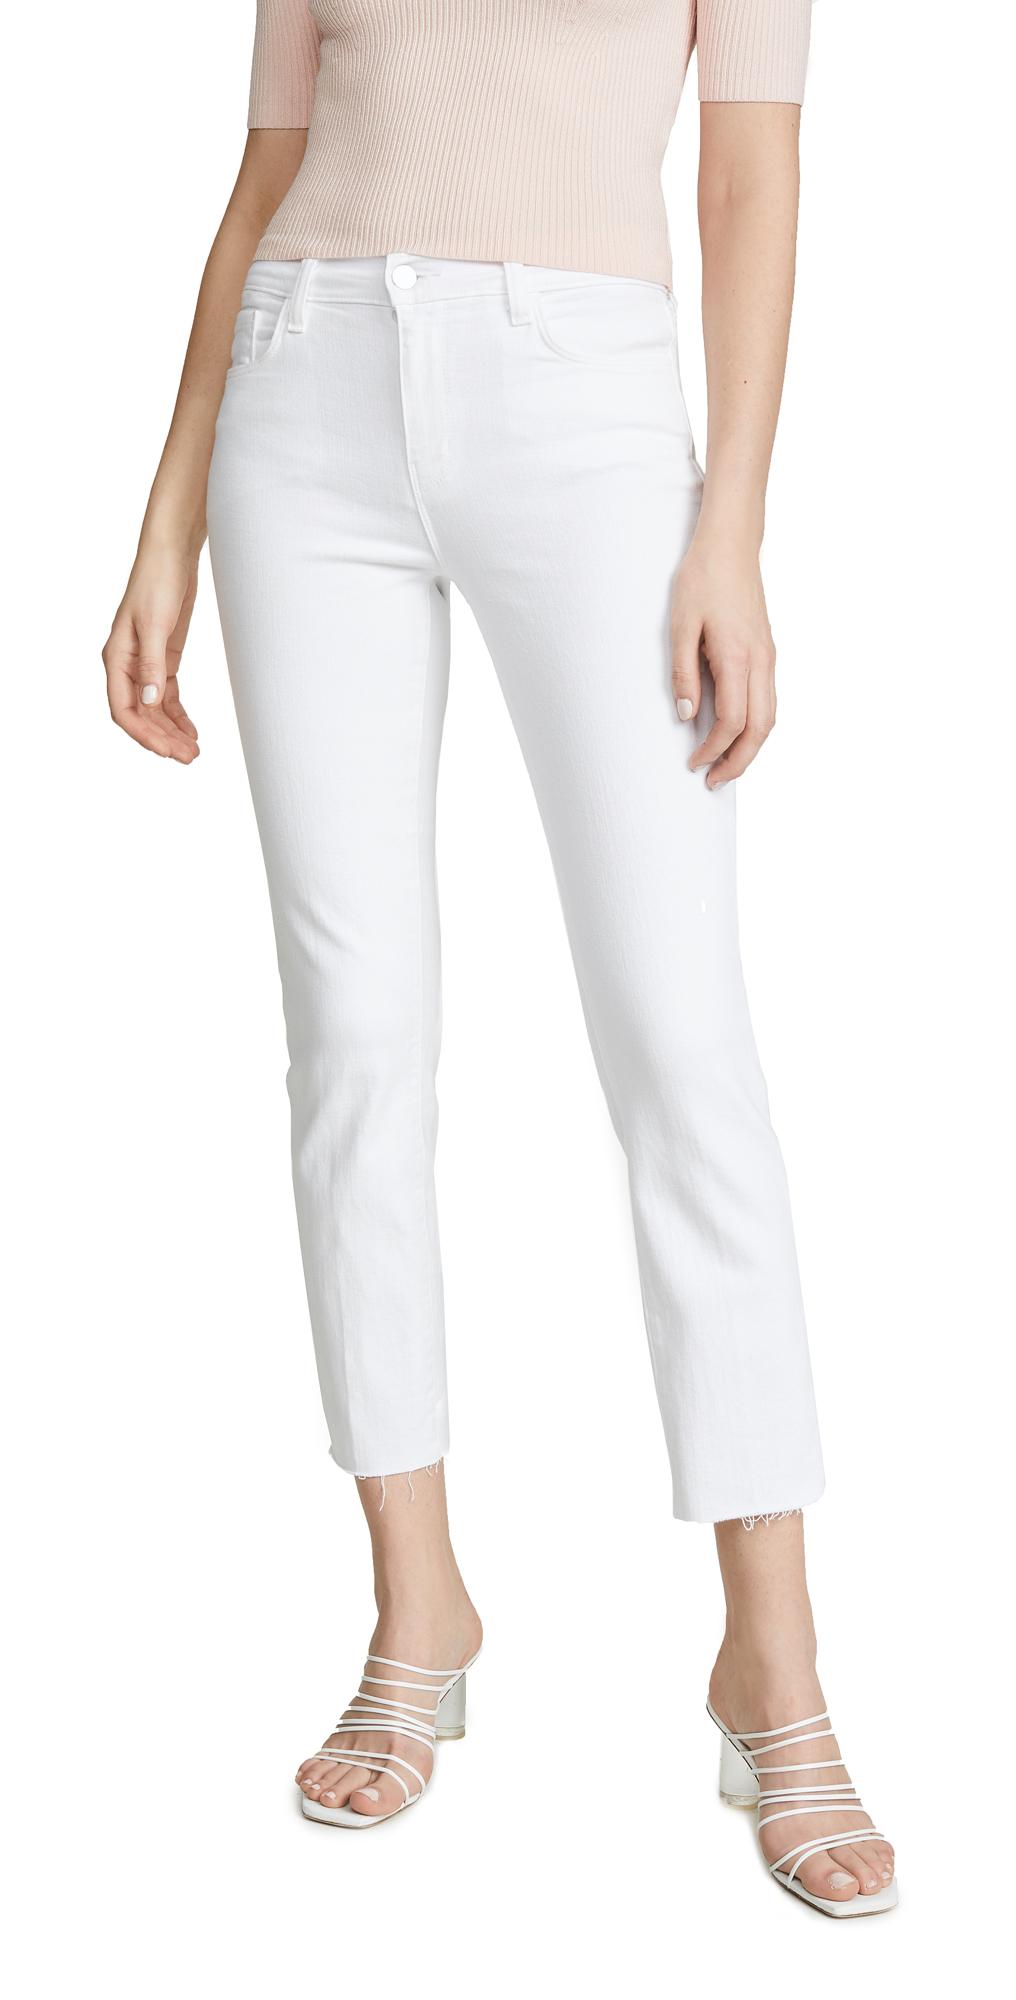 L'AGENCE Sada High Rise Crop Jeans